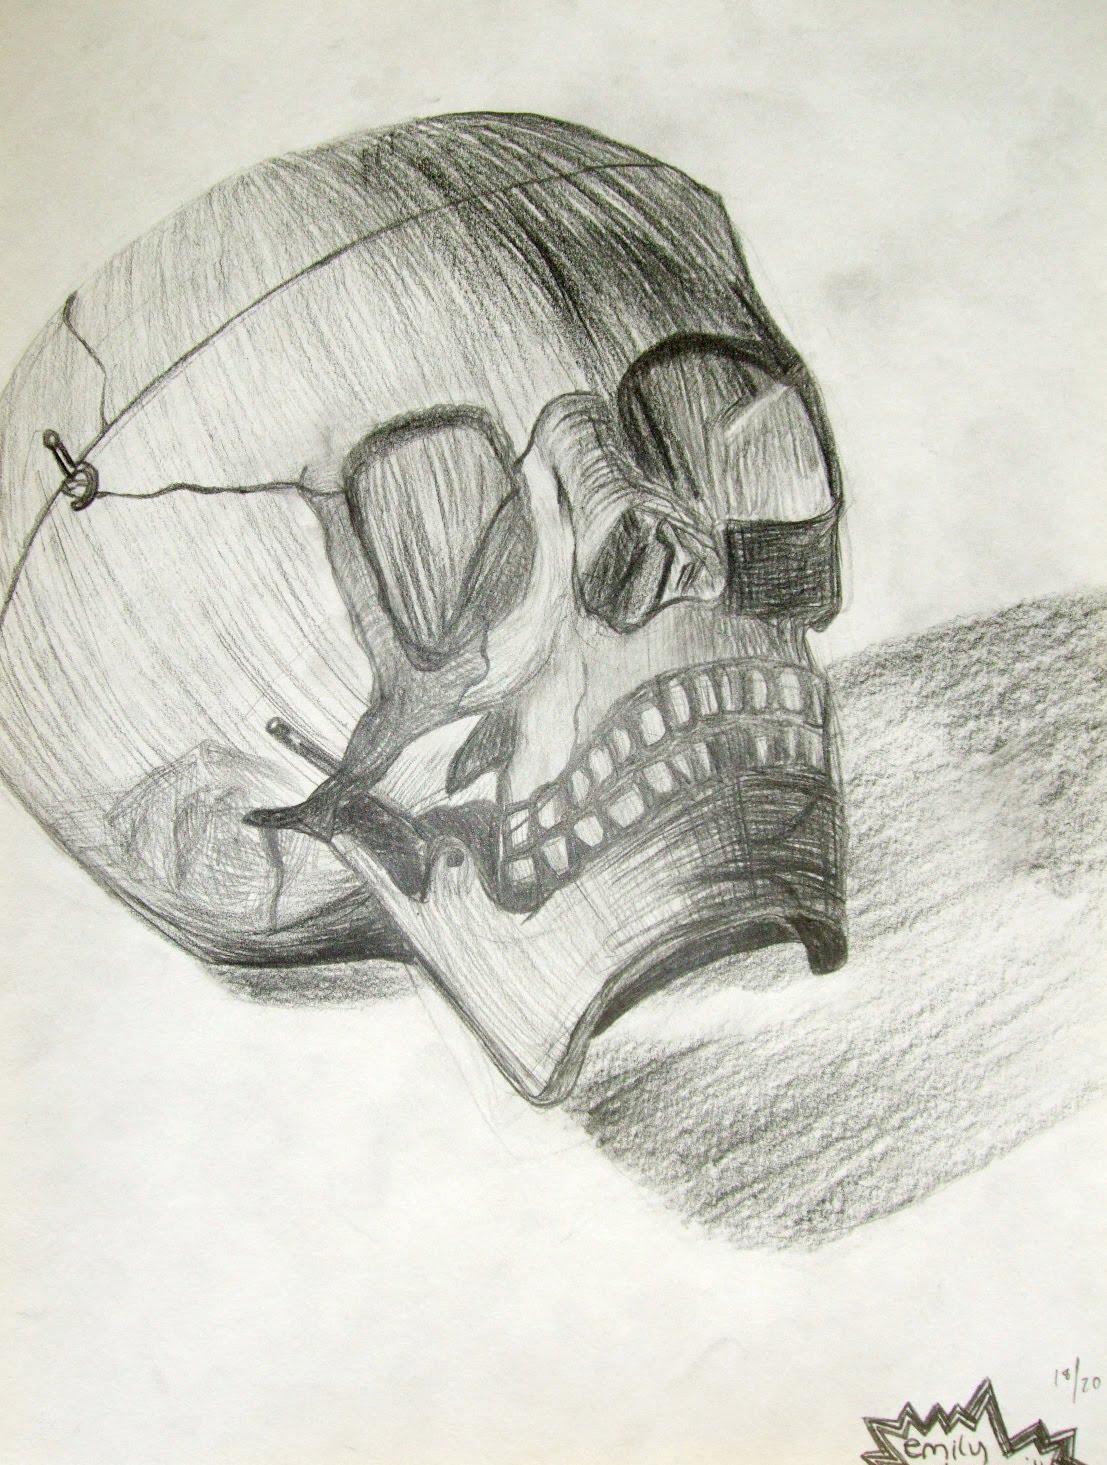 1107x1465 Highschoolart Skull Pencil Drawing High School Art